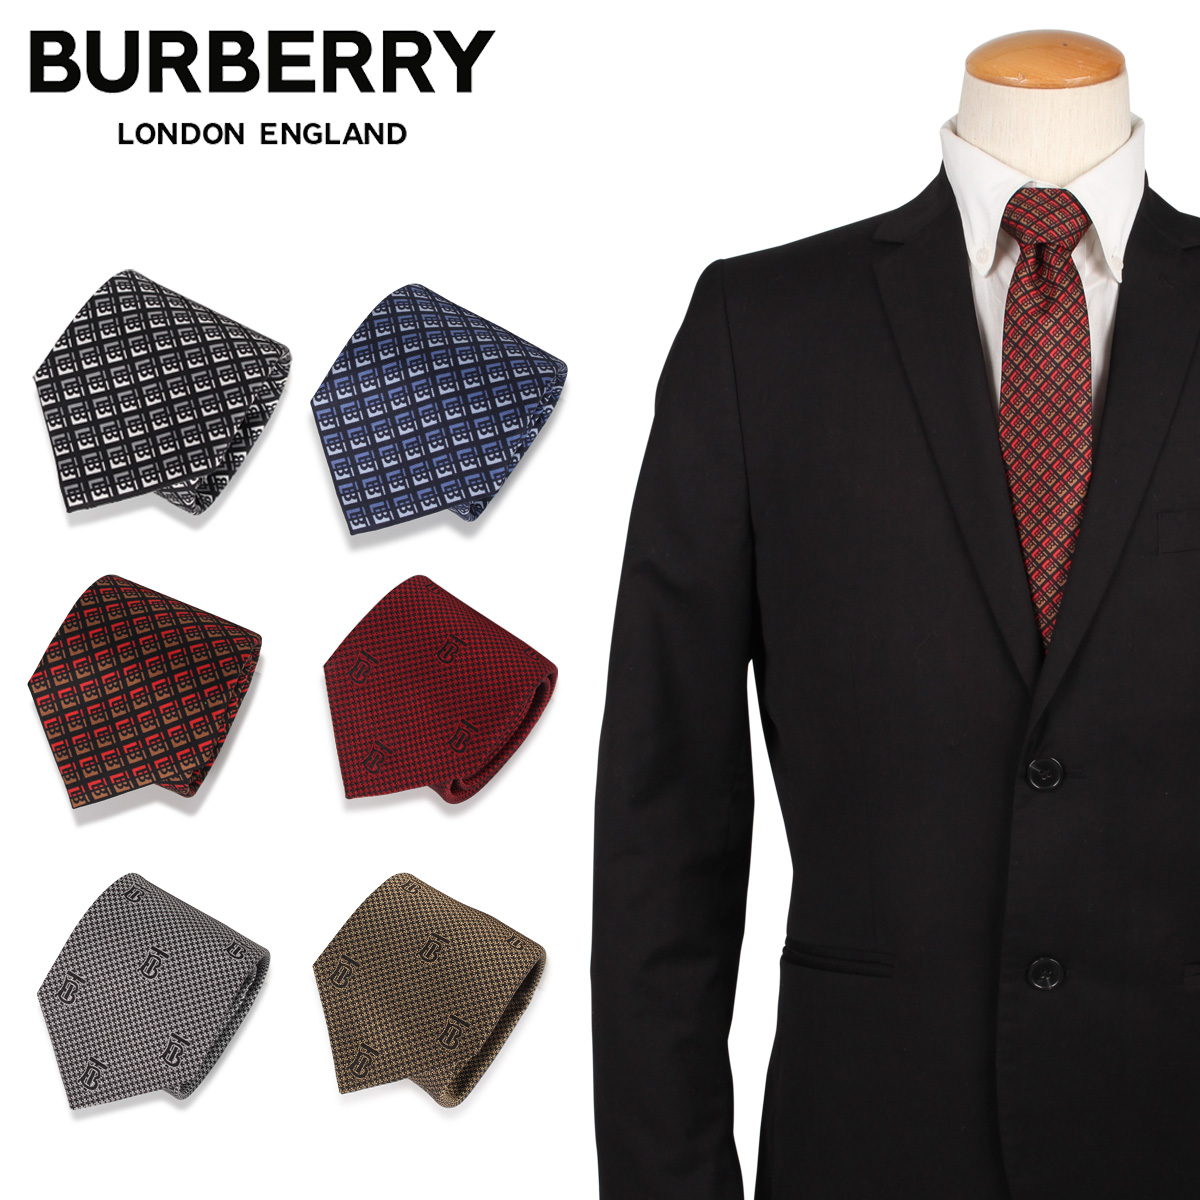 BURBERRY バーバリー ネクタイ メンズ イギリス製 シルク TIE